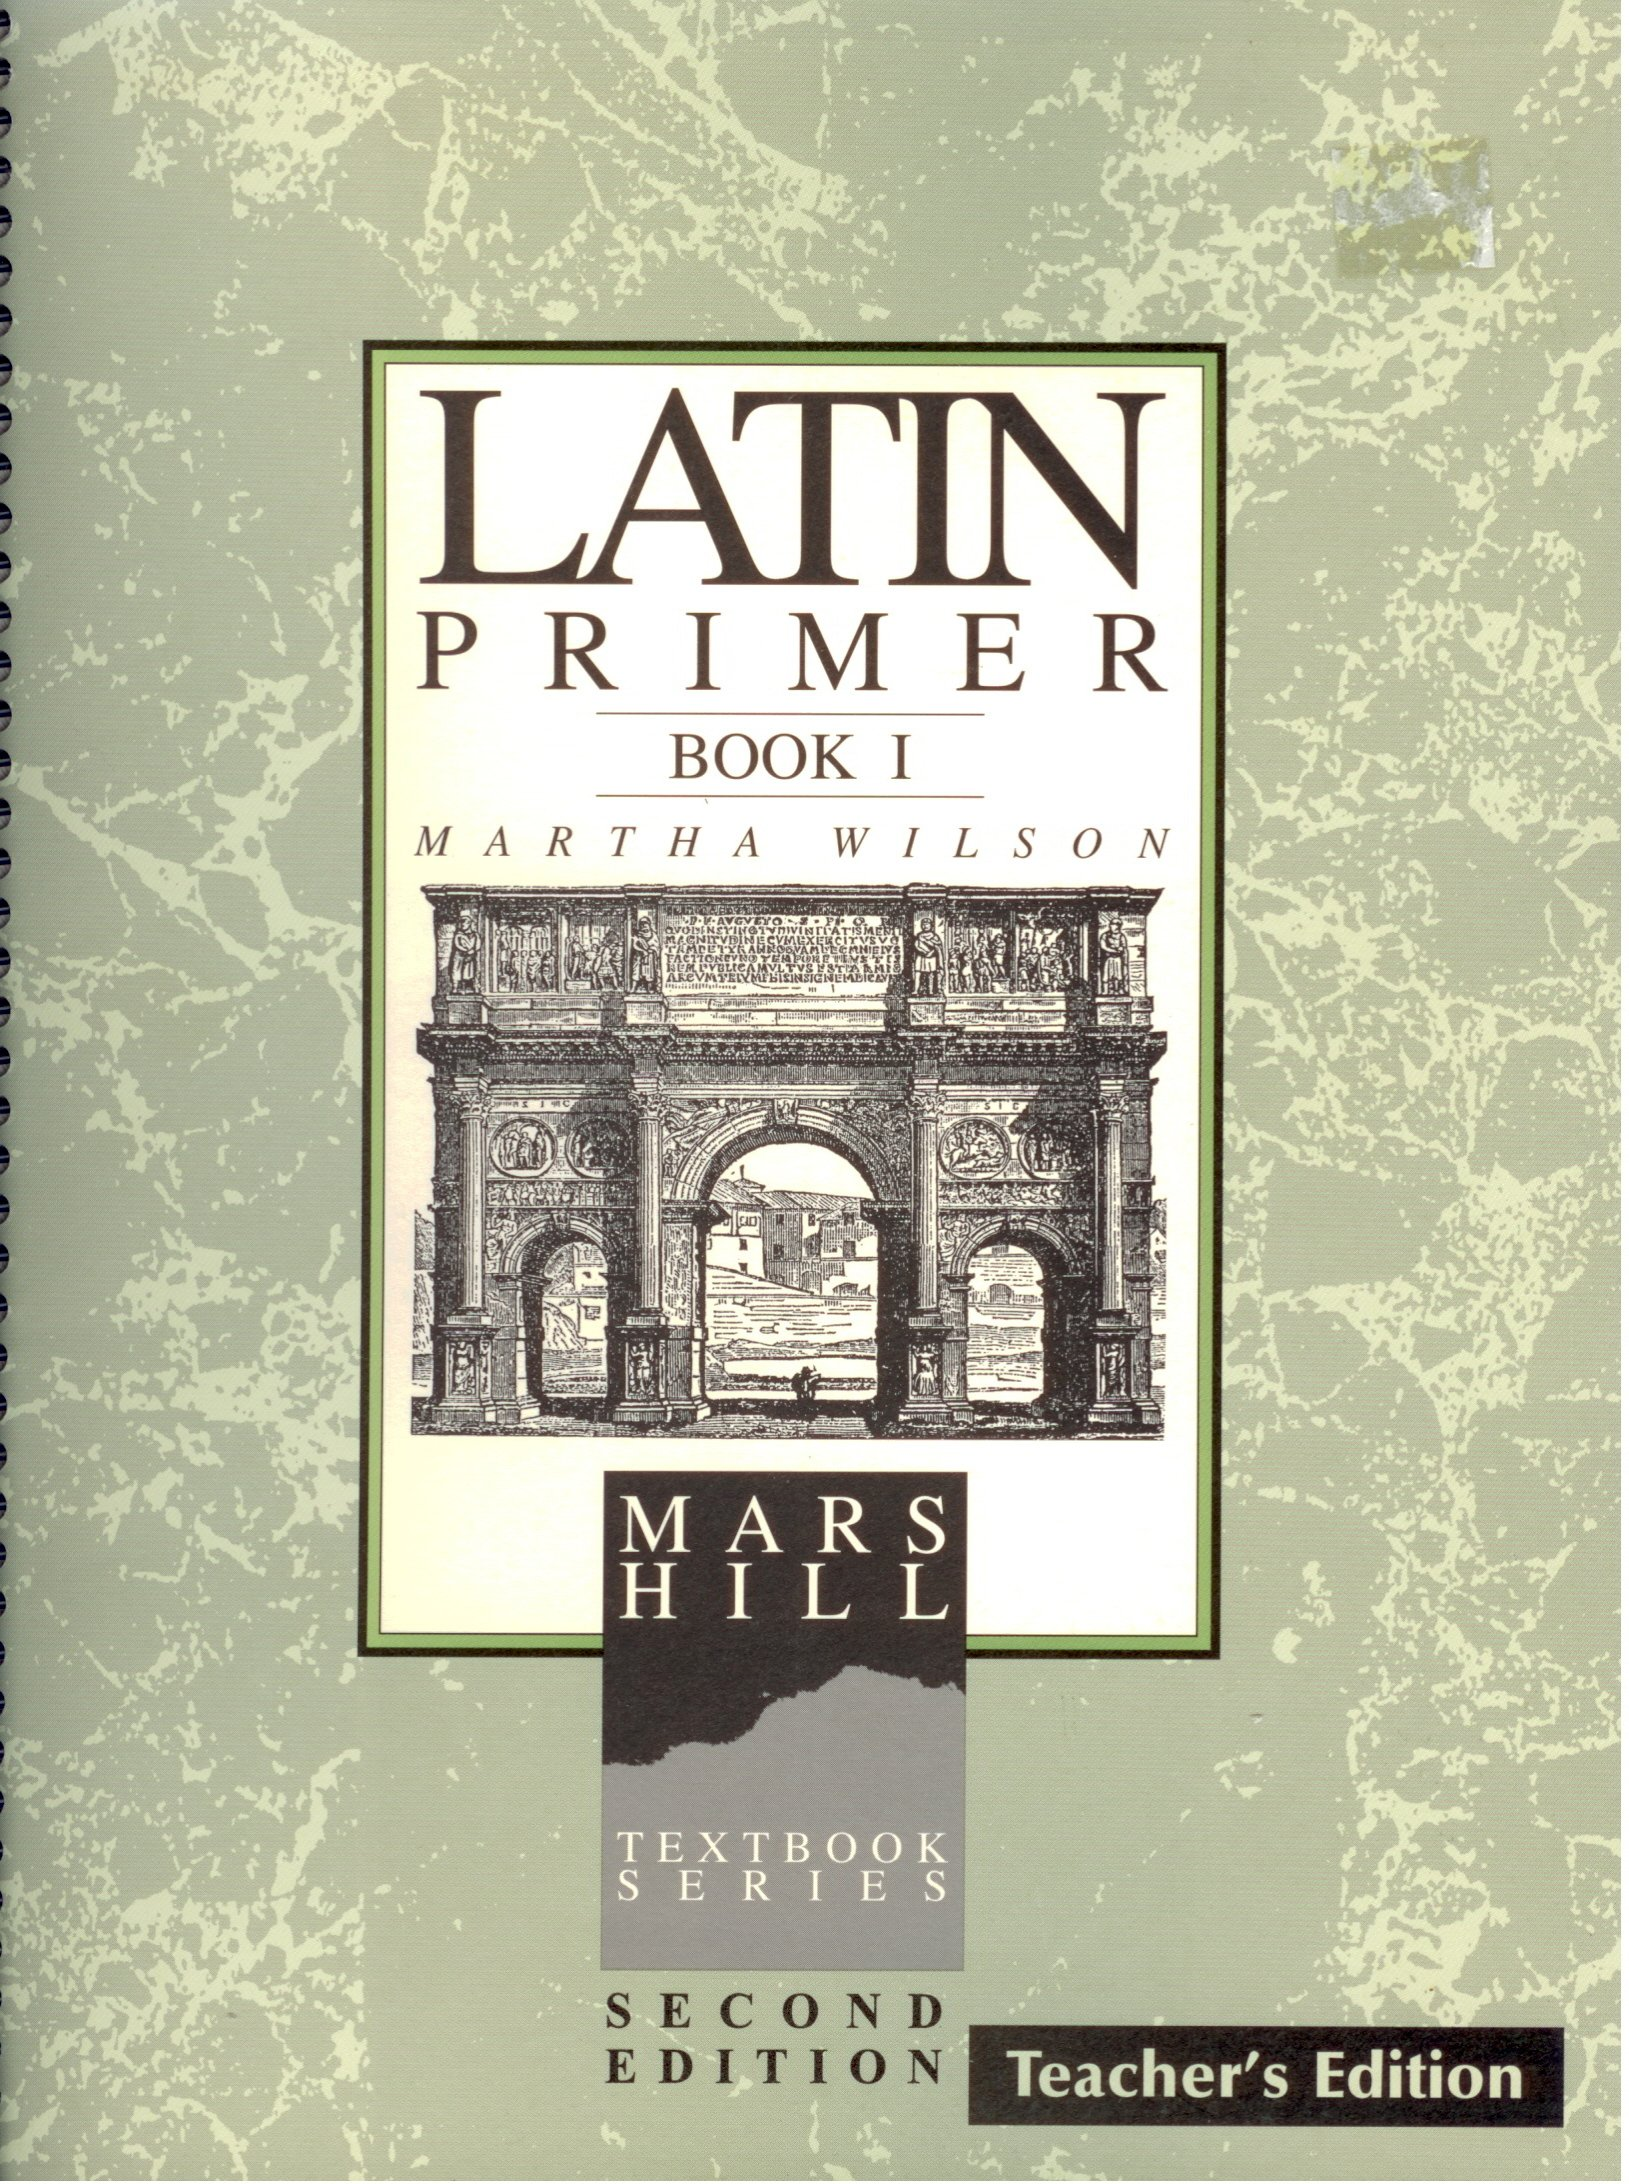 Latin Primer Book 1, 2nd Edition, Teacher's Edition (2001) ebook